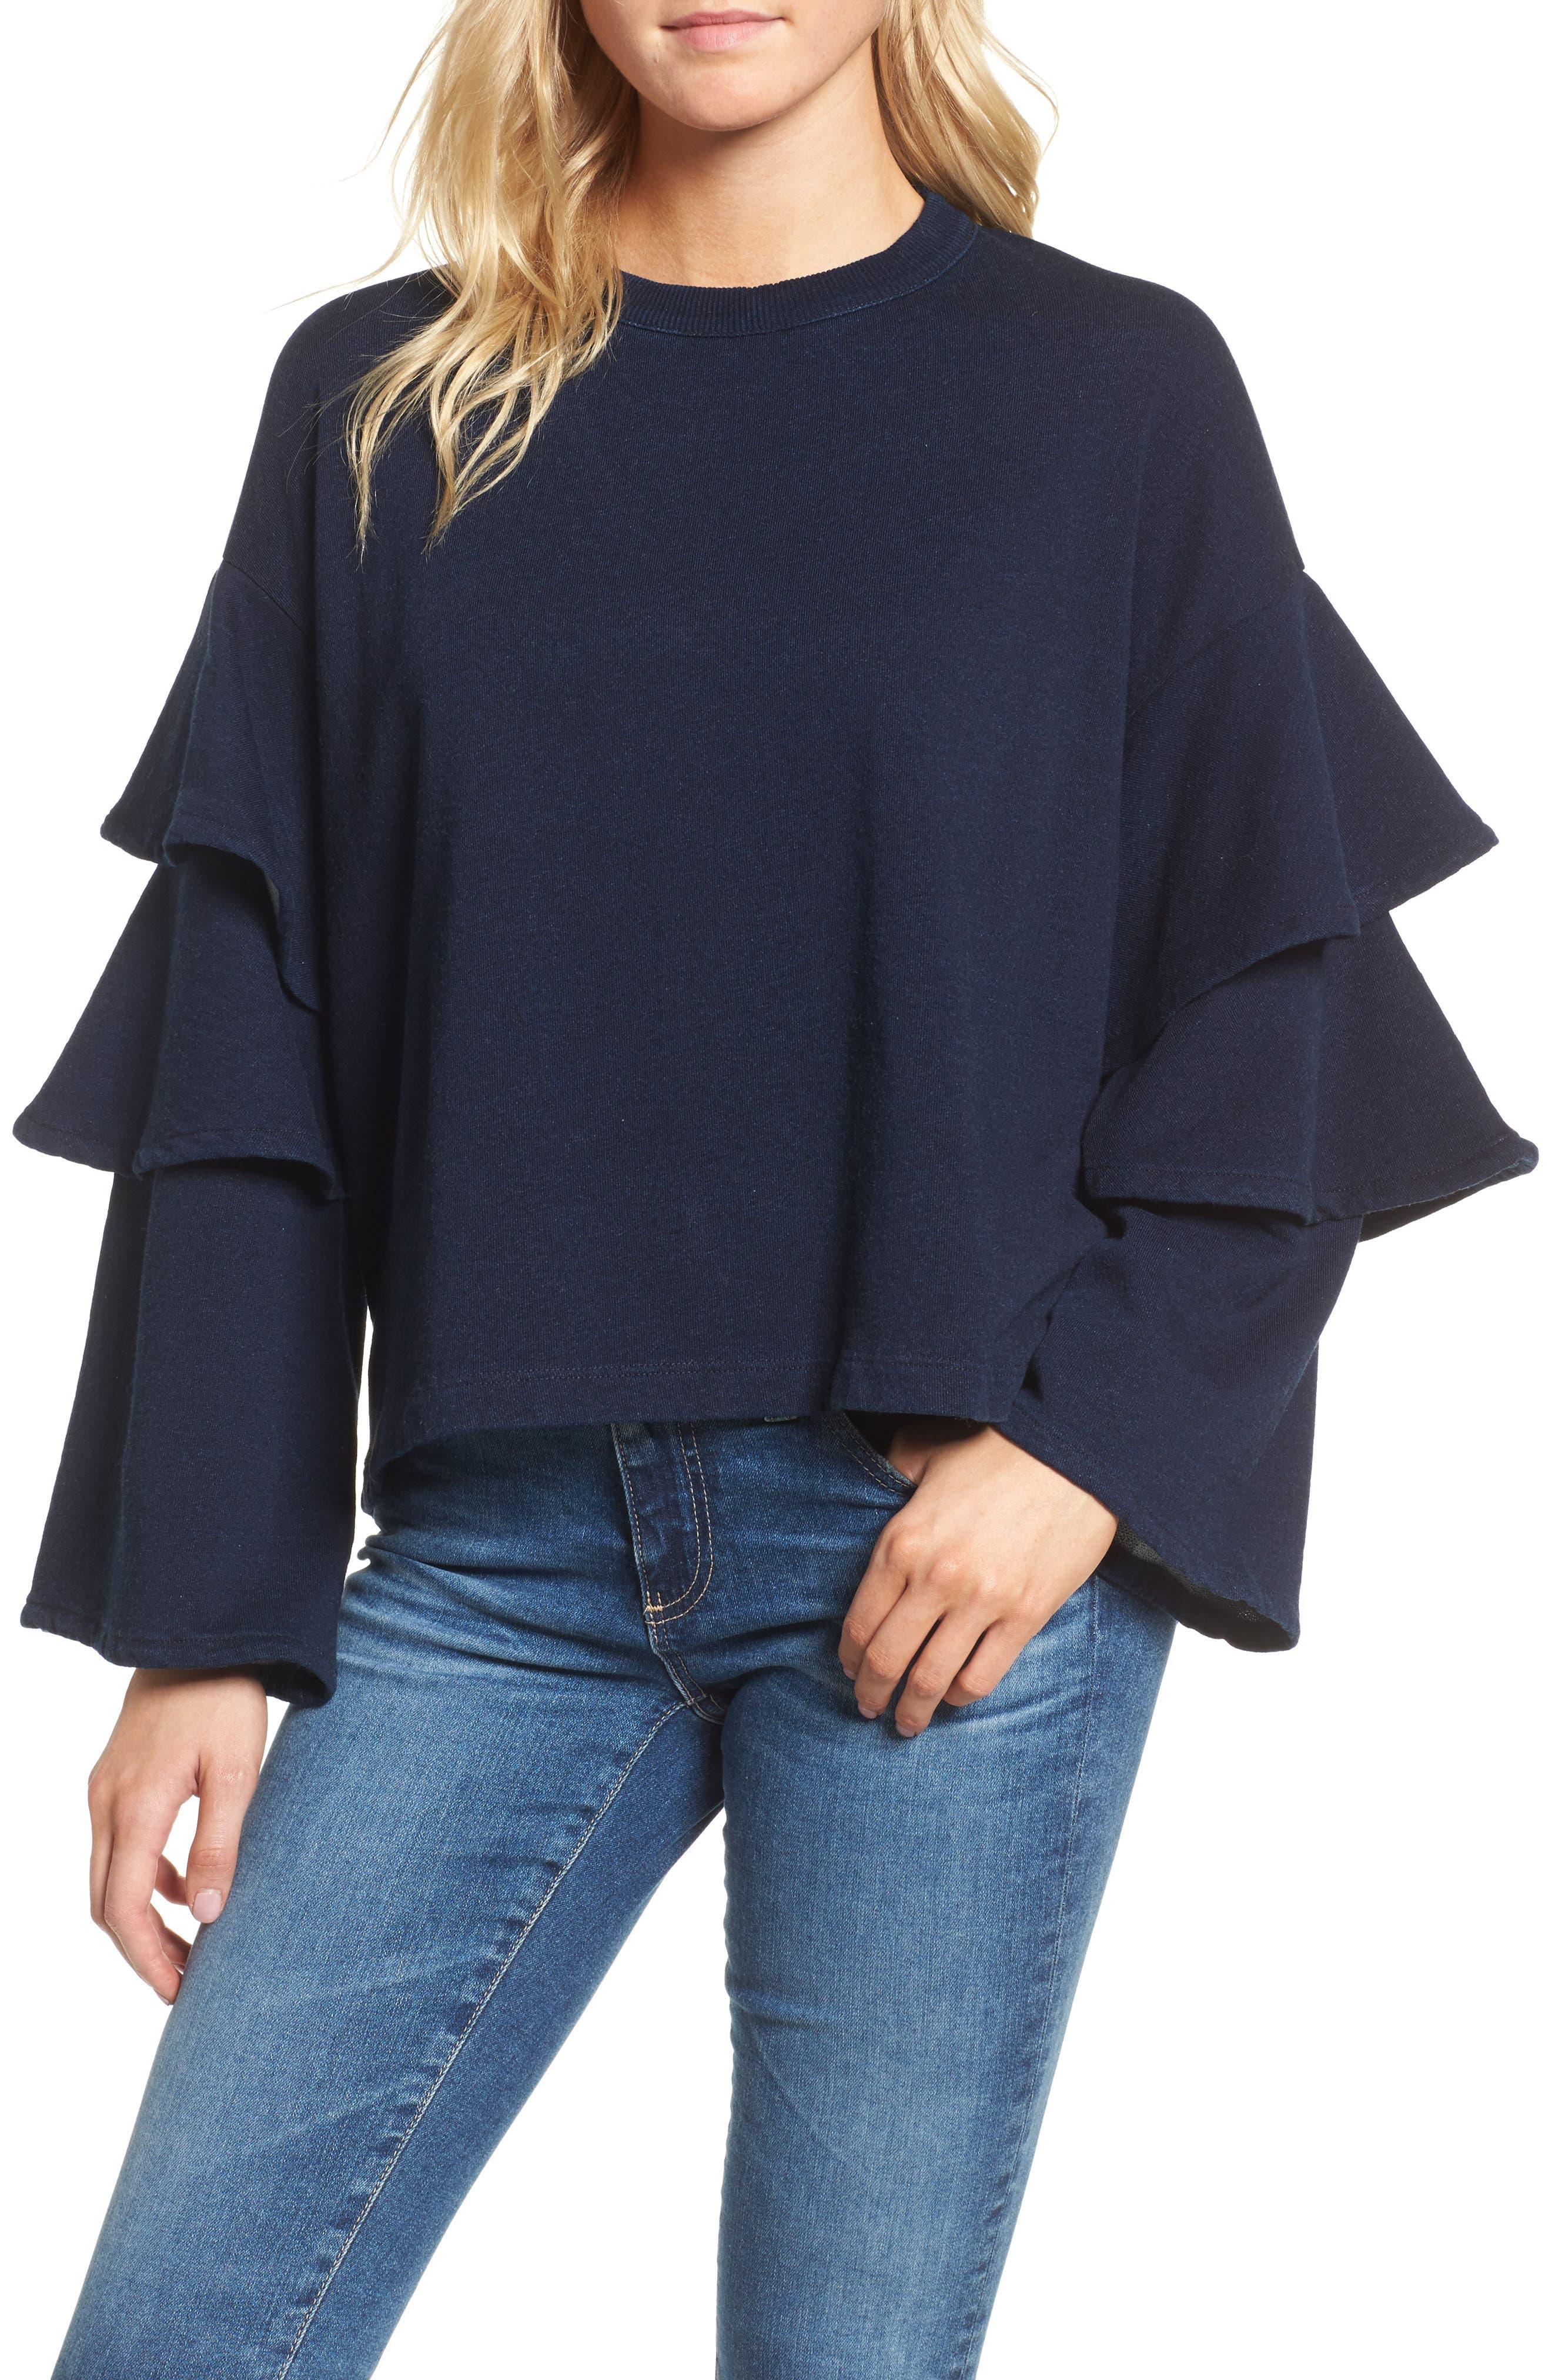 Pearl Ruffle Sweatshirt,                         Main,                         color, Dark Indigo